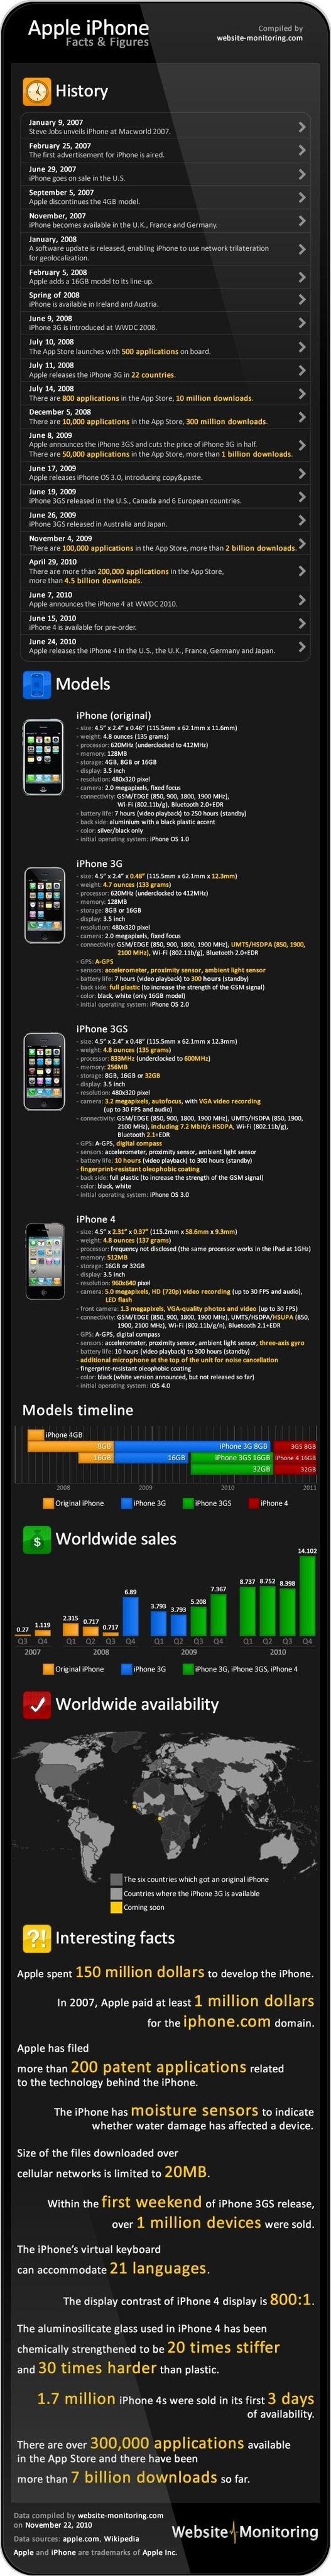 L'histoire de l'iPhone Online marketing trends, History